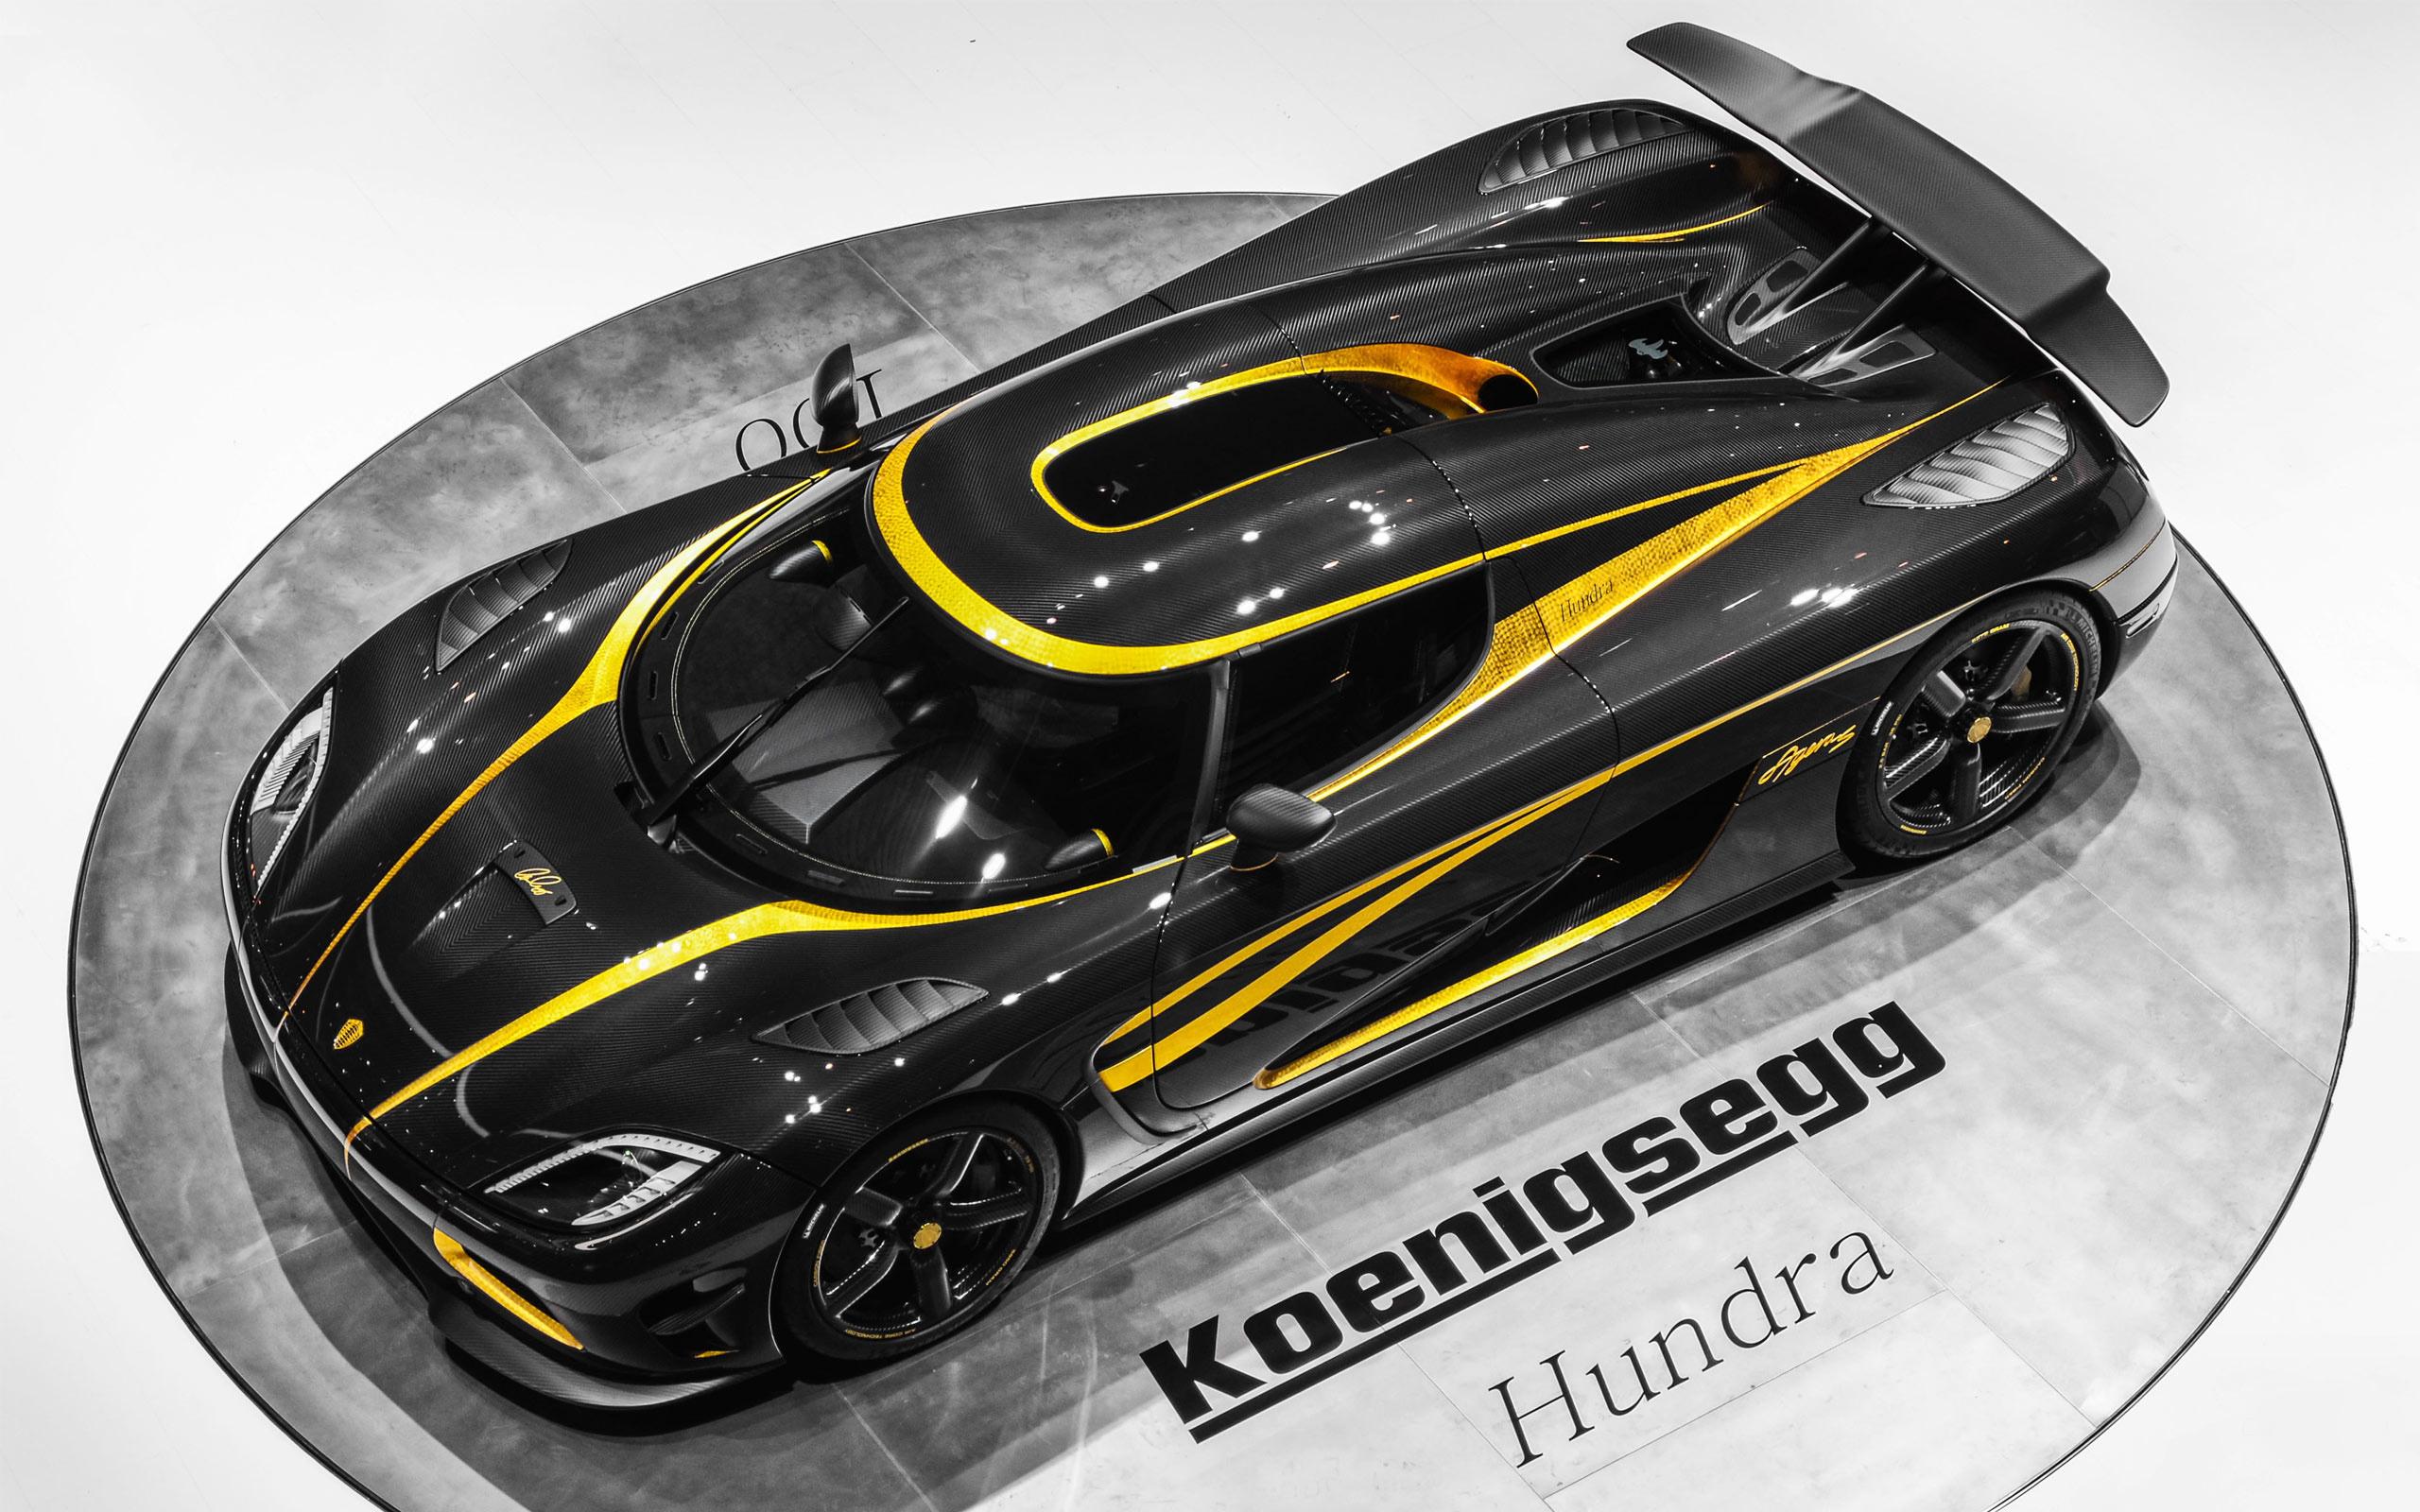 2014 Koenigsegg Agera S Hundra Wallpaper HD Car Wallpapers 2560x1600